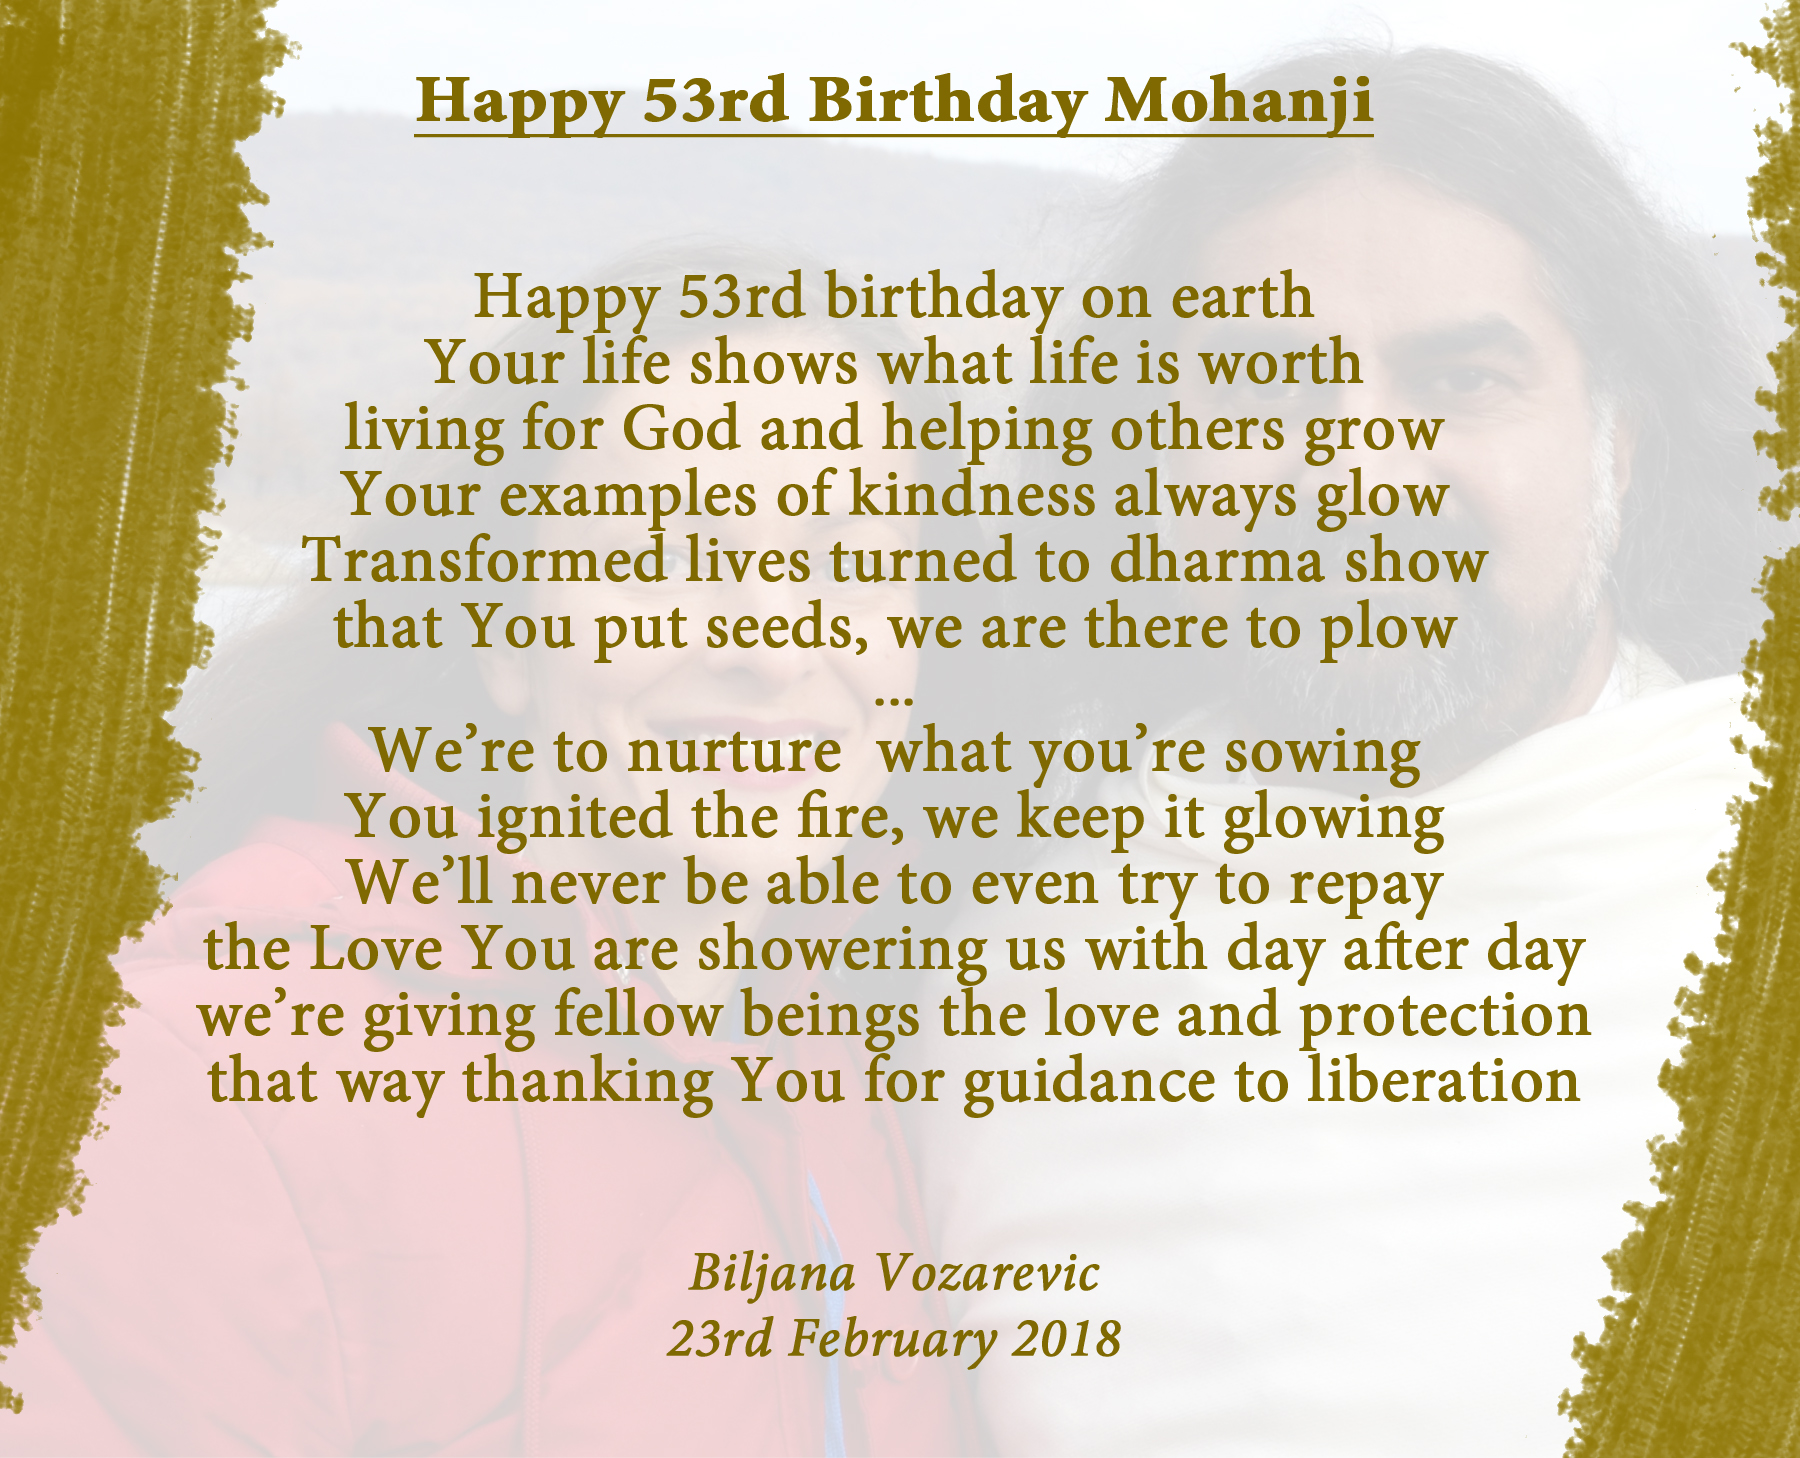 Happy birthday Mohanji - poem by Biljana Vozarevic